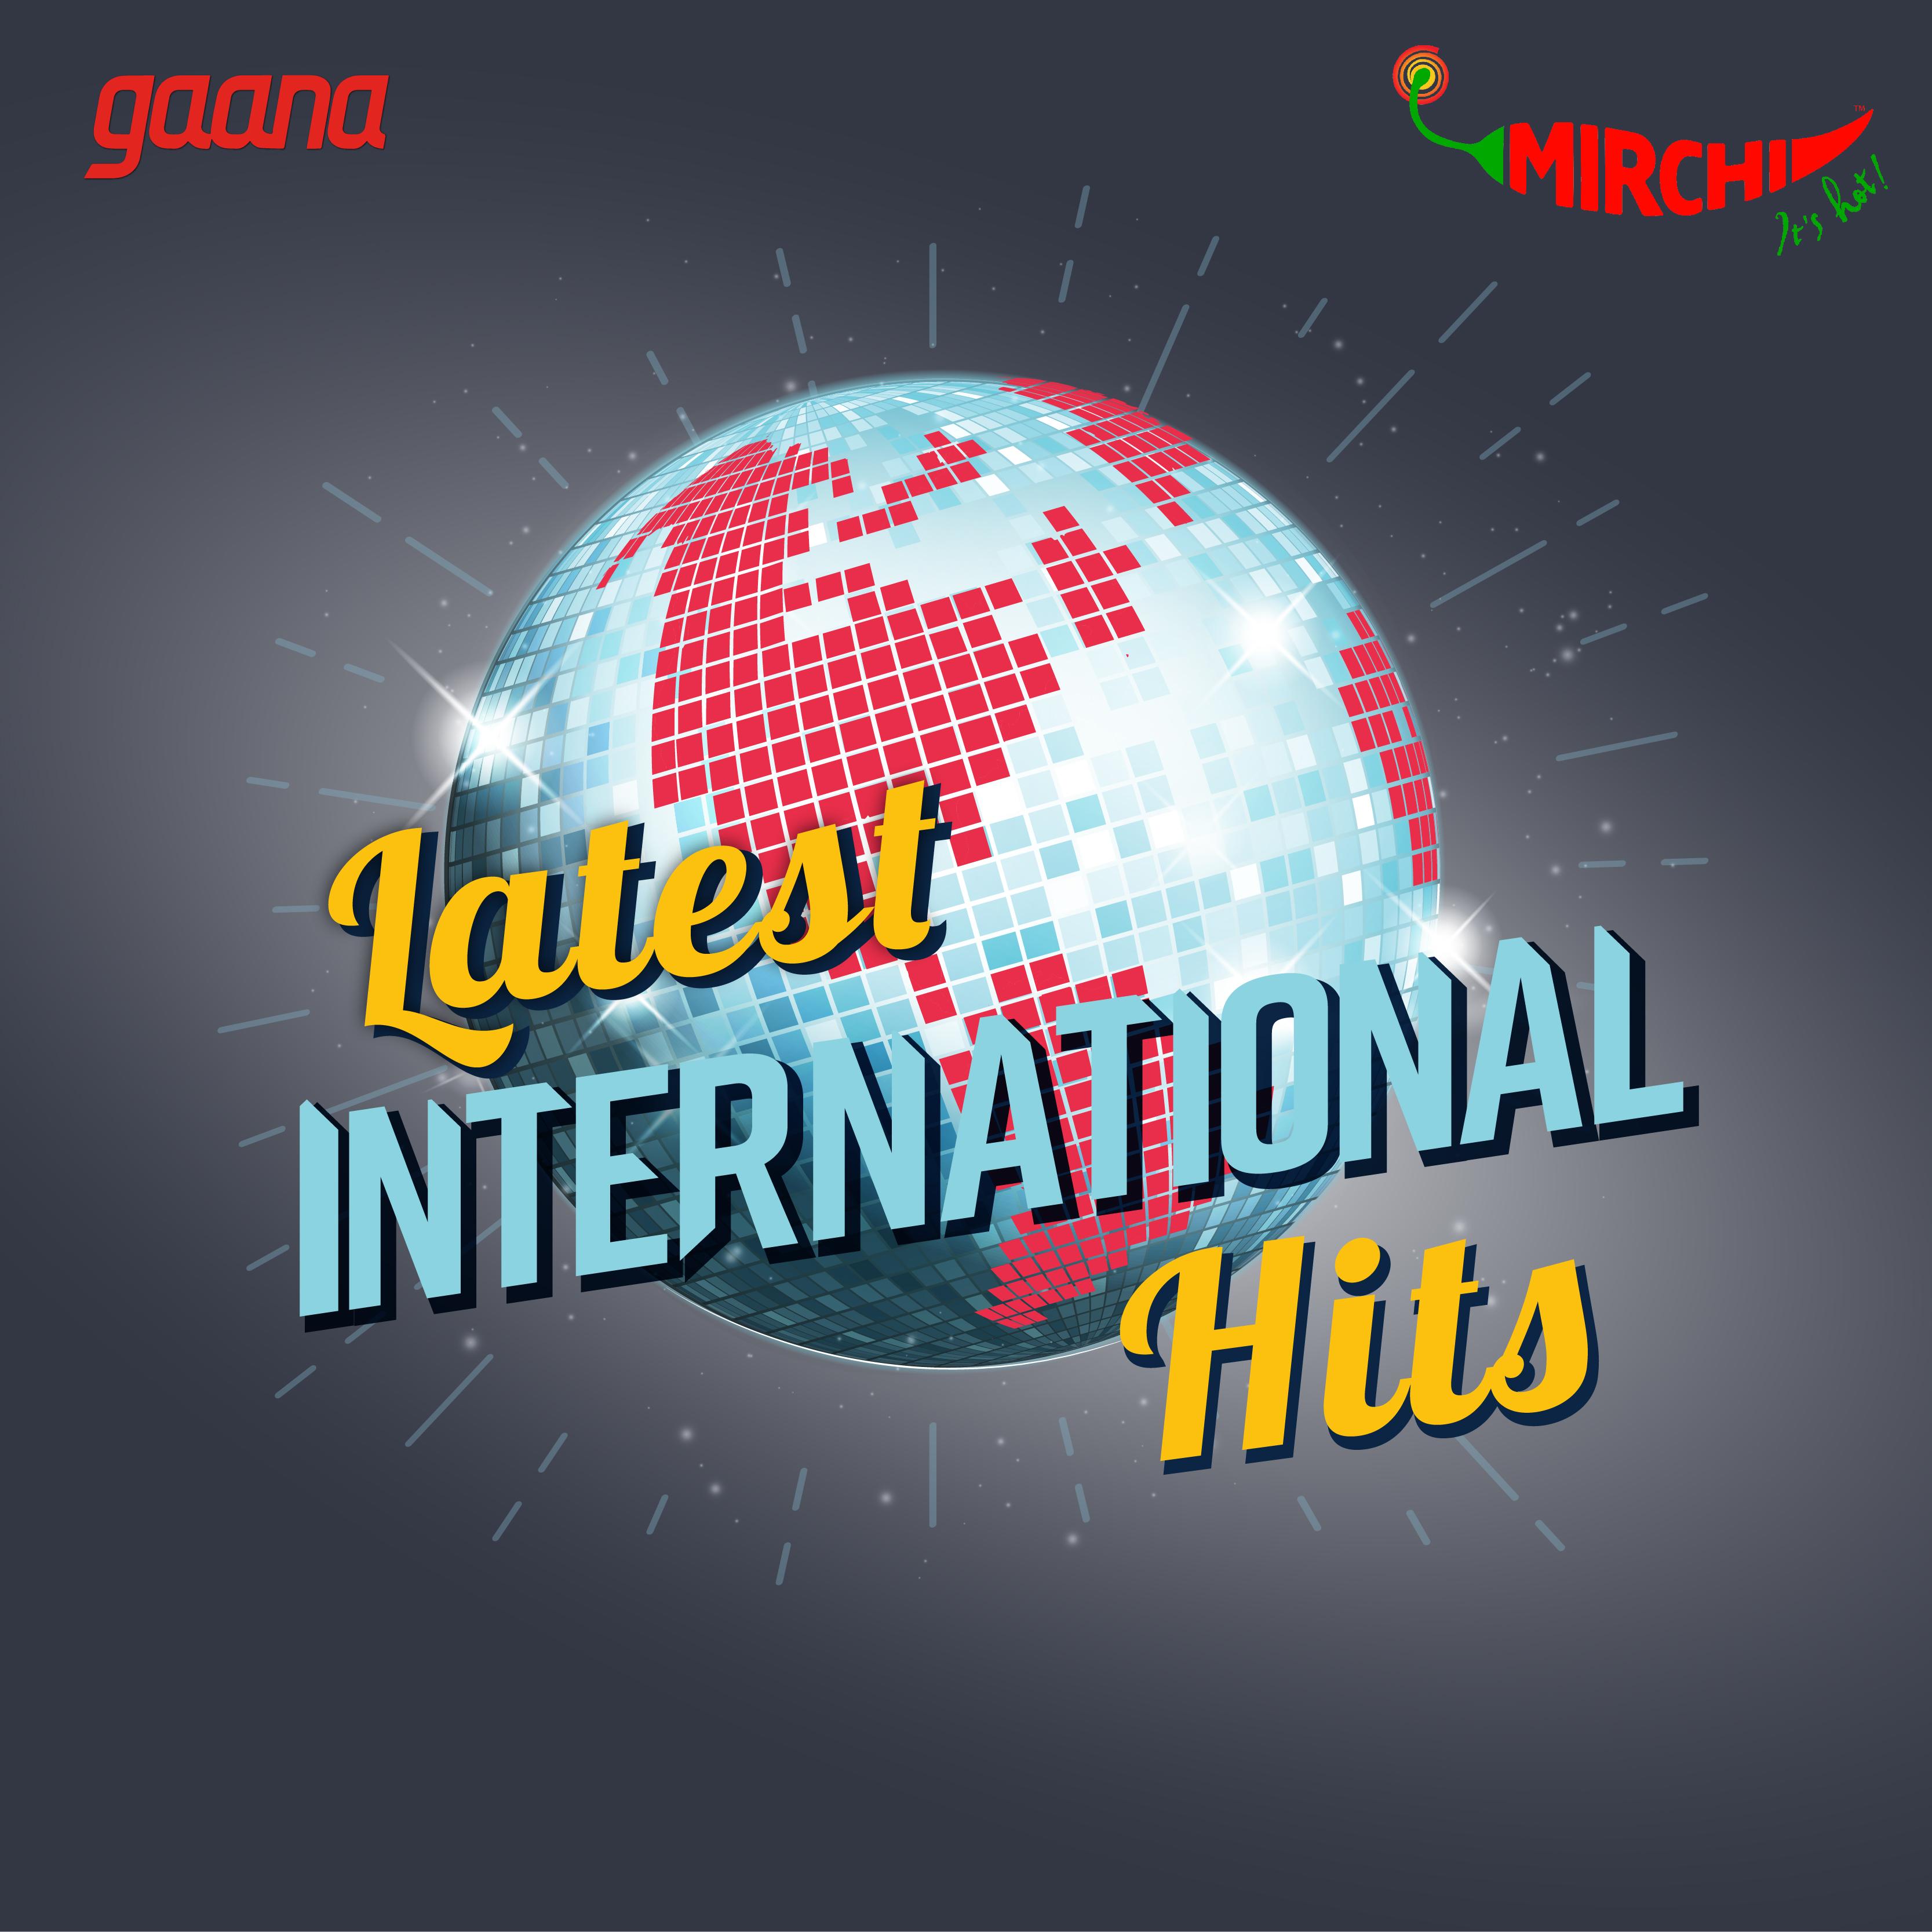 International Hitz